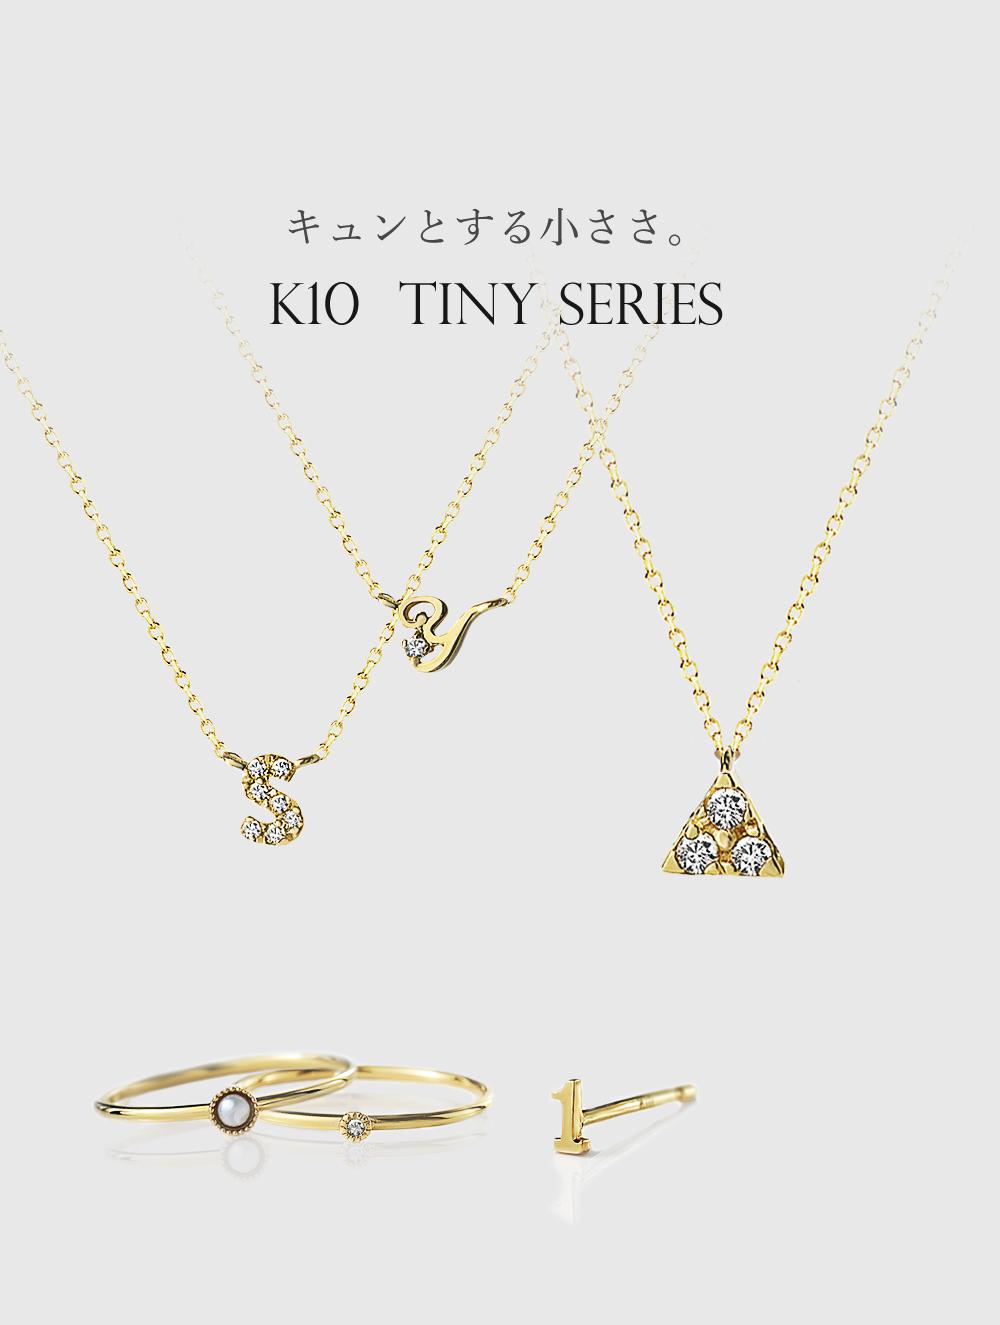 K10 tiny series